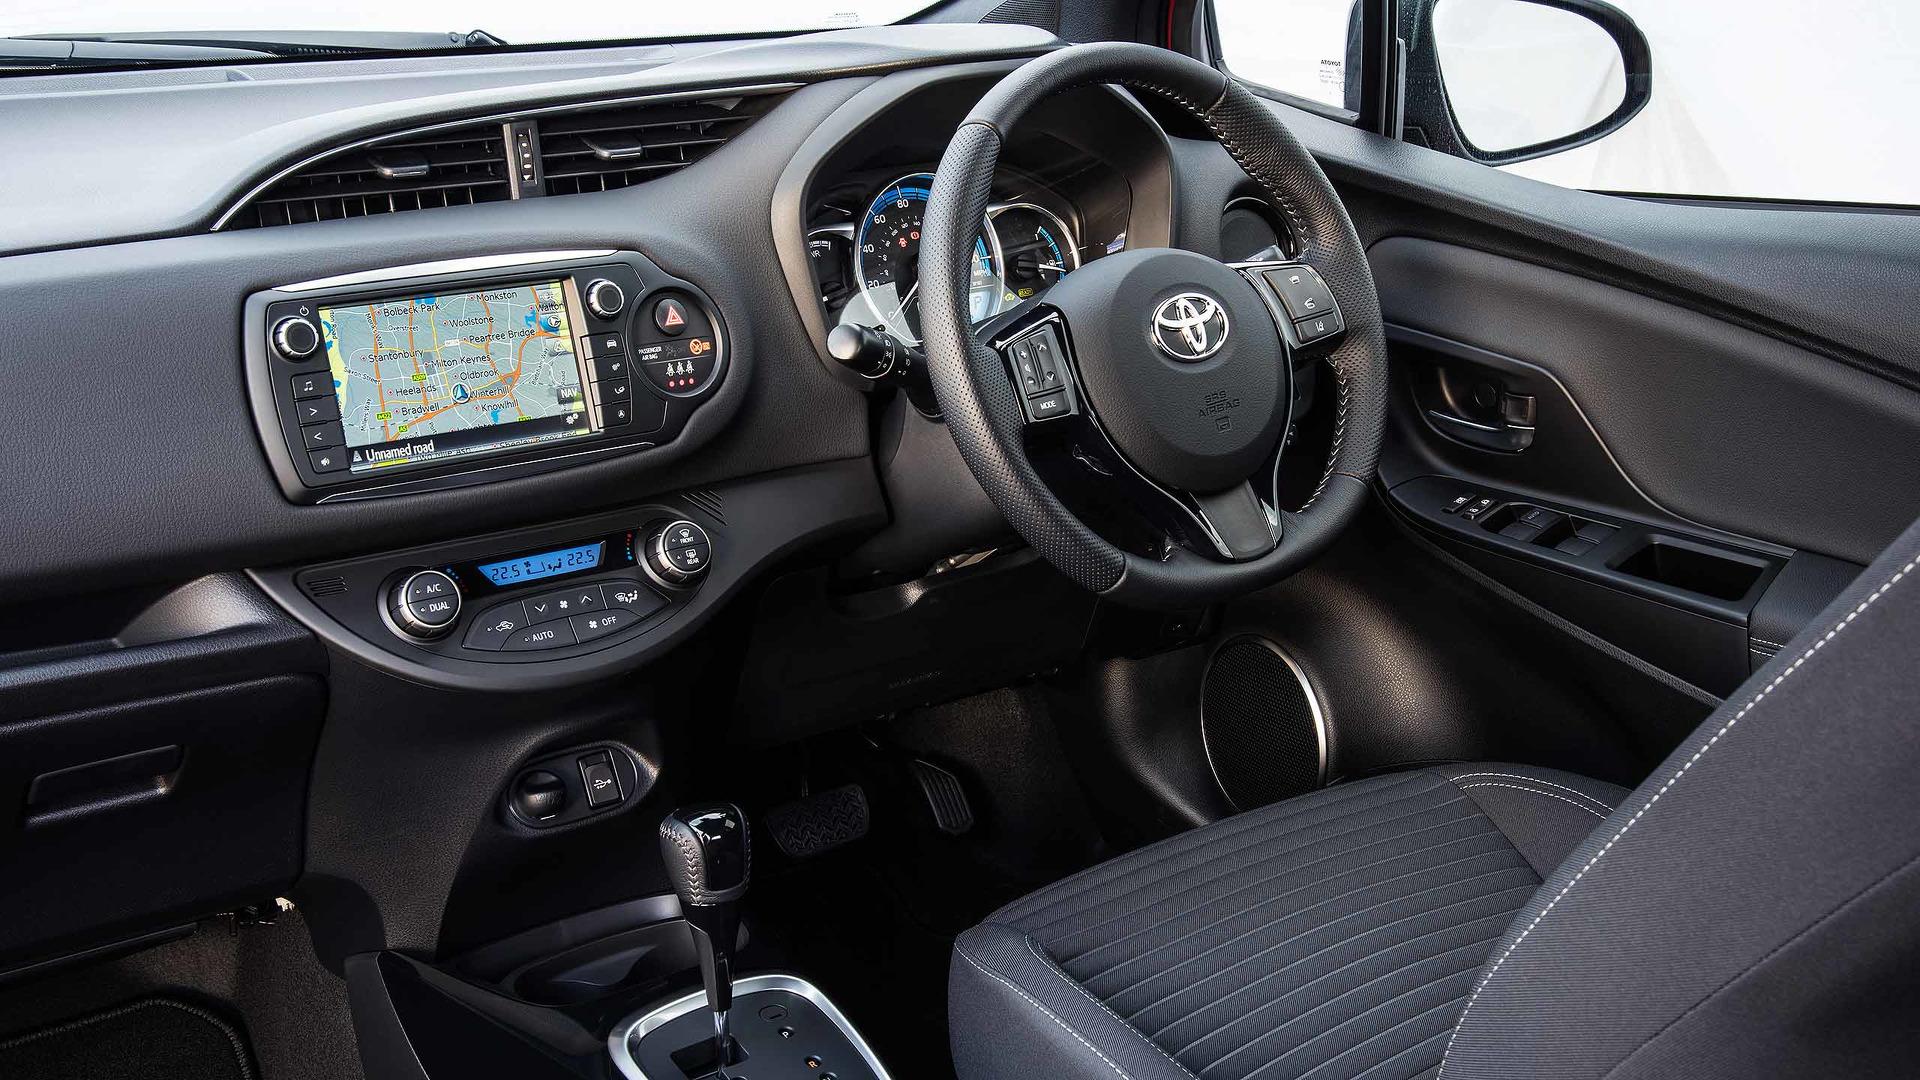 Kekurangan Toyota Yaris 2017 Harga